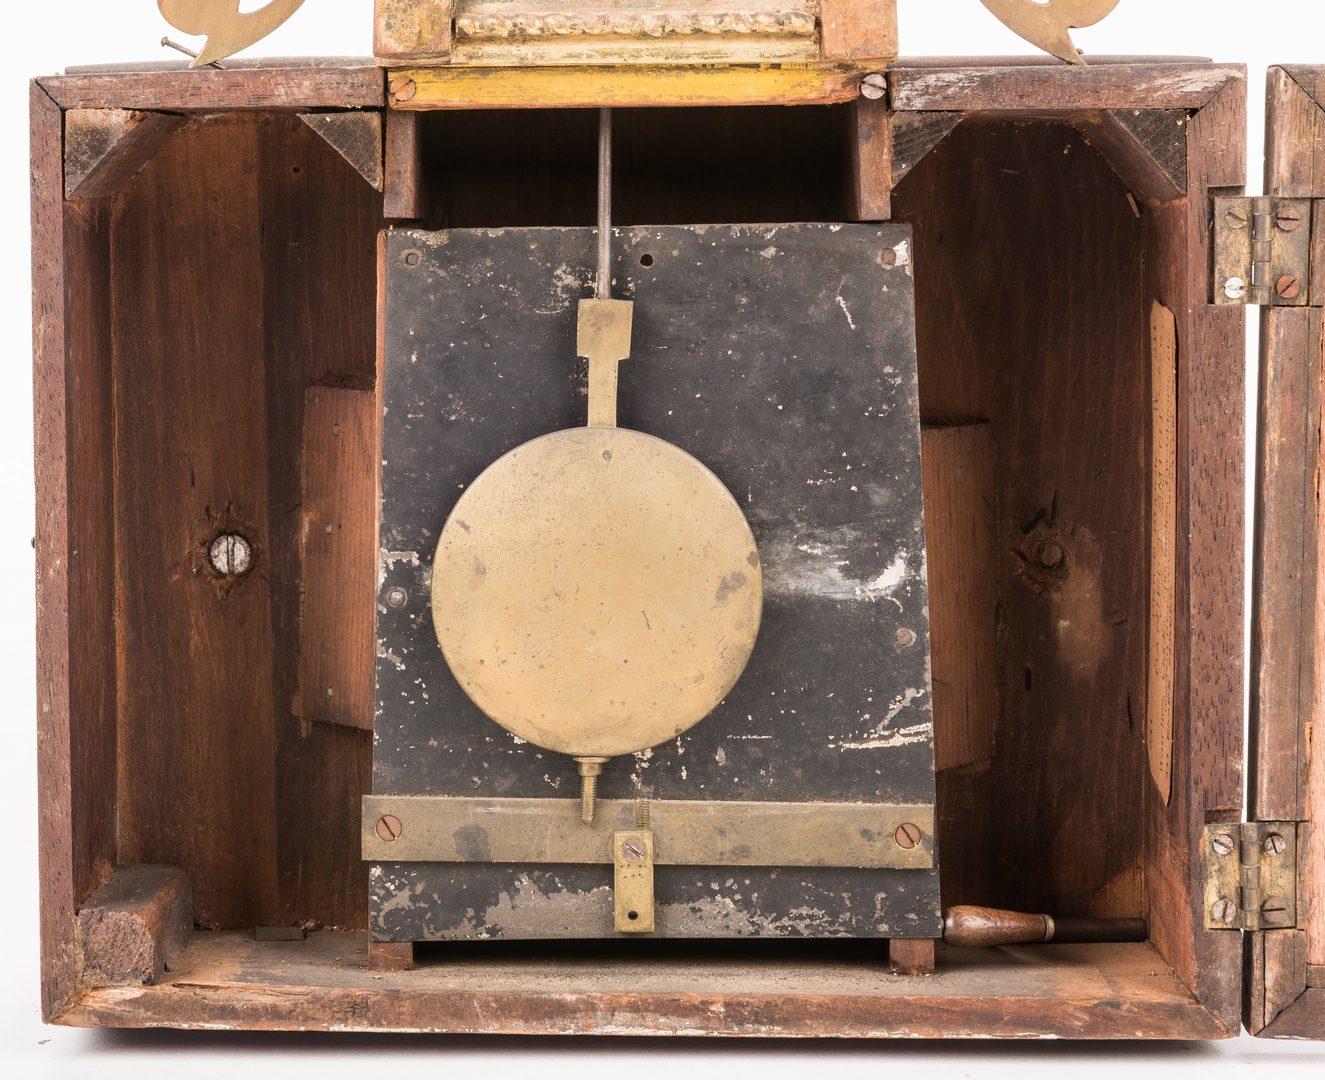 Lot 159: Banjo Clock w/ Mass. State House Reverse Painting